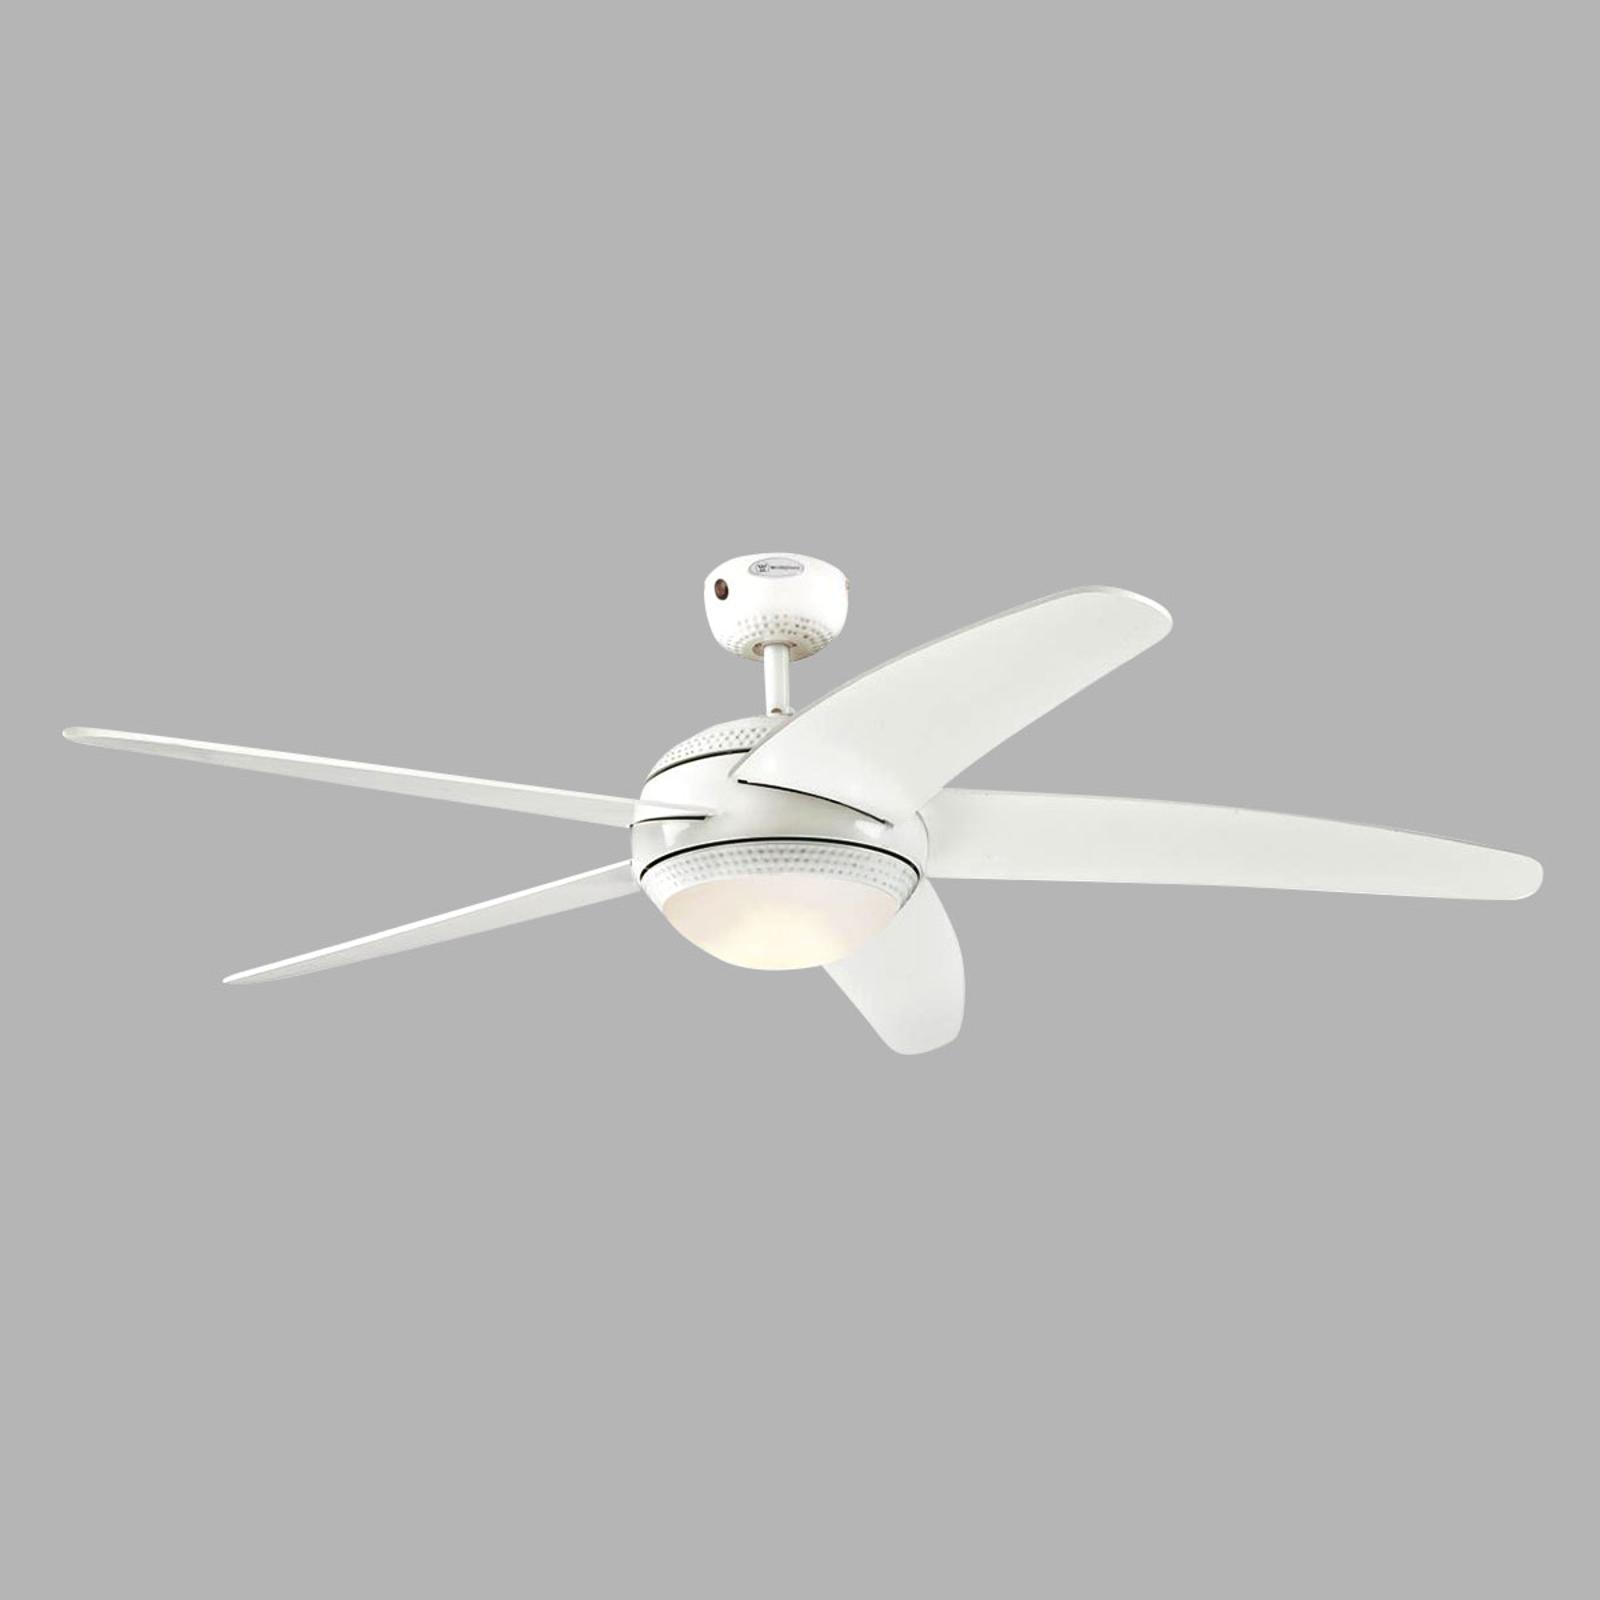 Westinghouse Bendan LED-Ventilator Flügel weiß